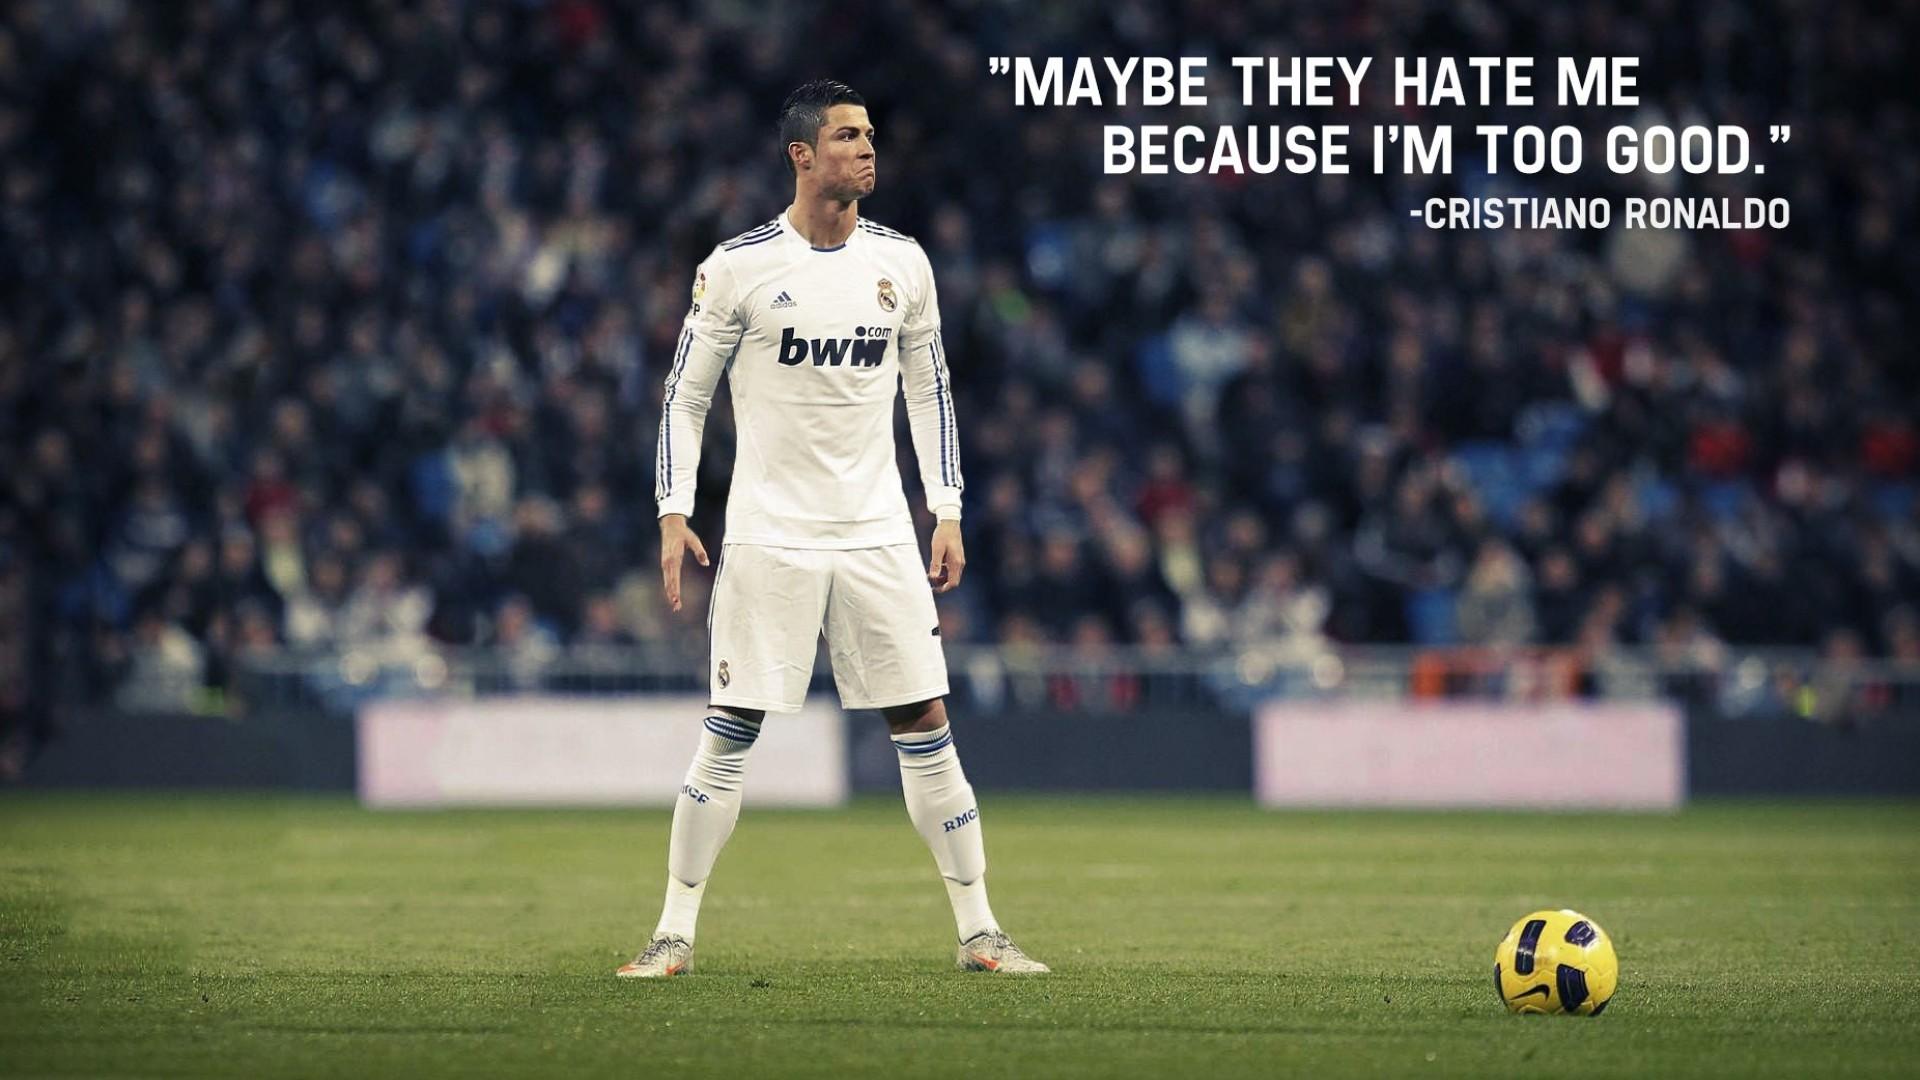 Madrid quote #1